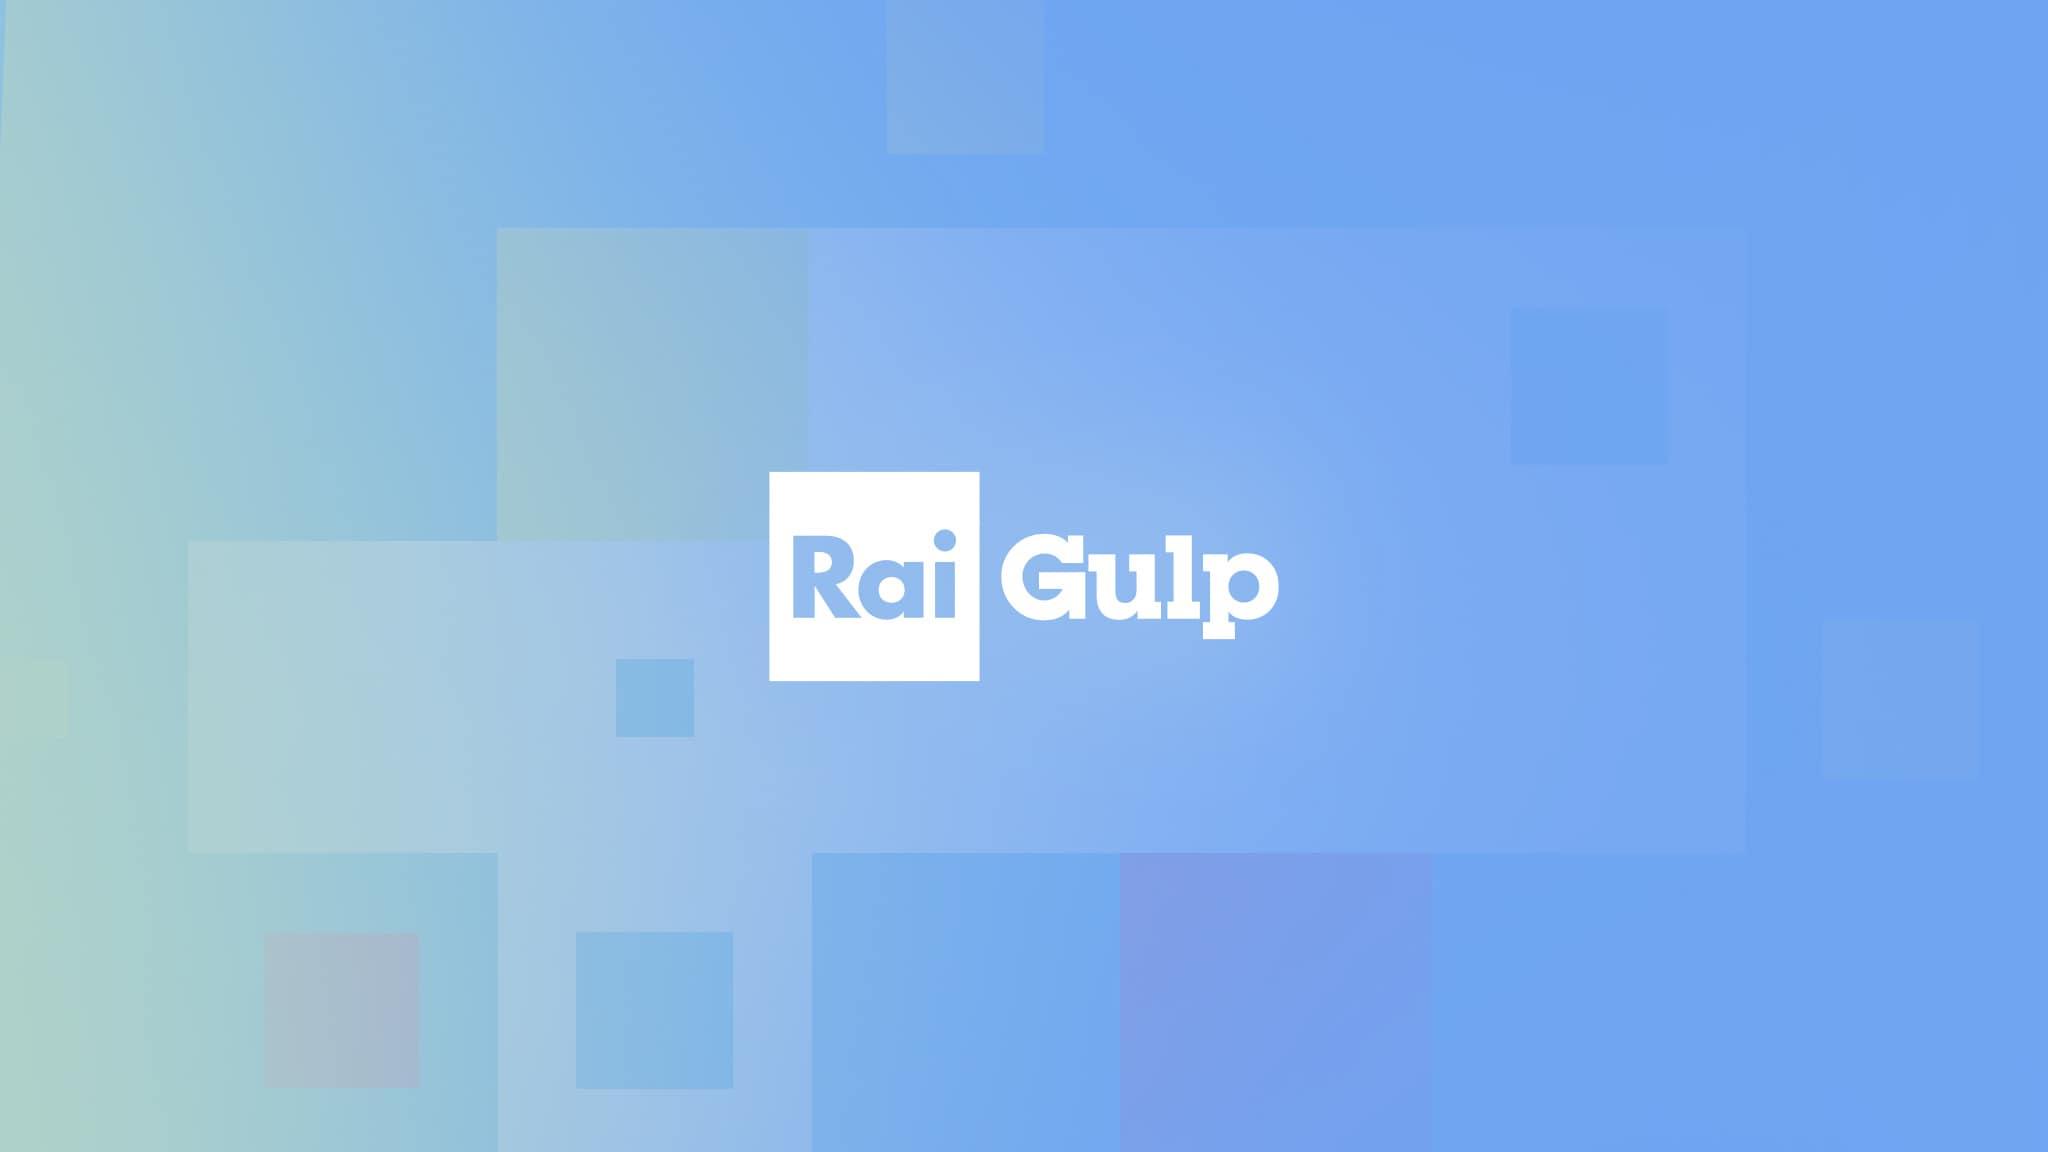 Rai Gulp 101 Dalmatian  Street - S1E12